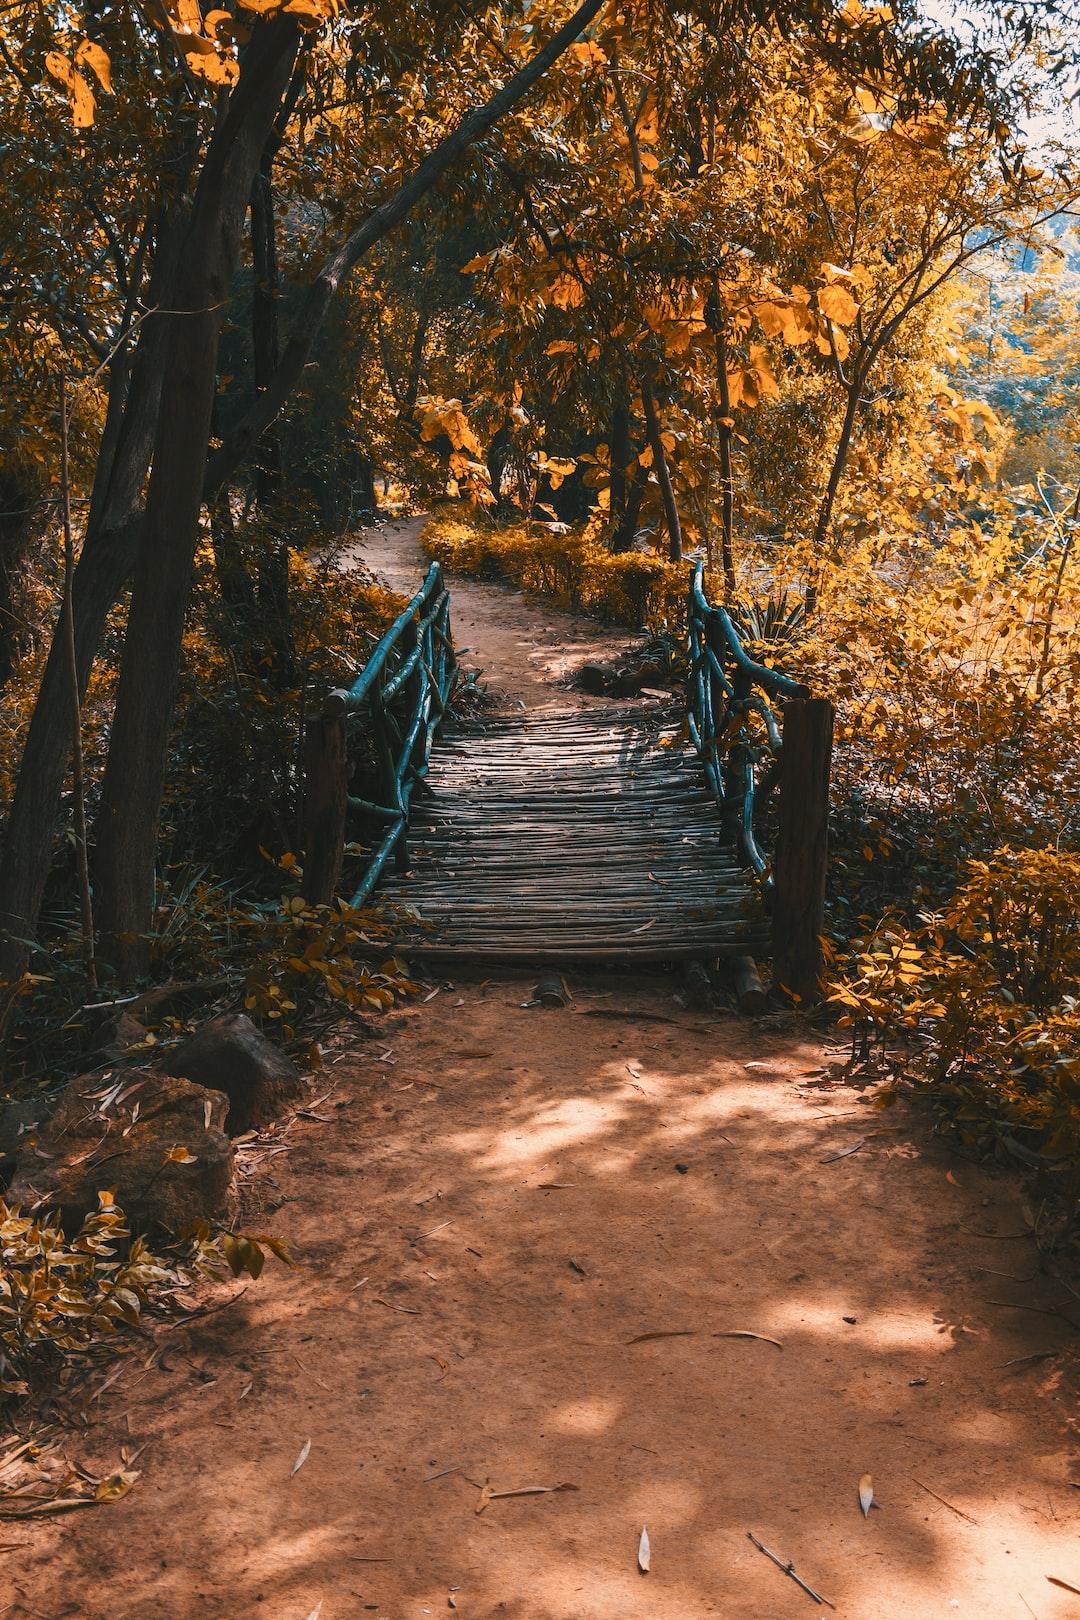 a wooden bridge to cross a water channel